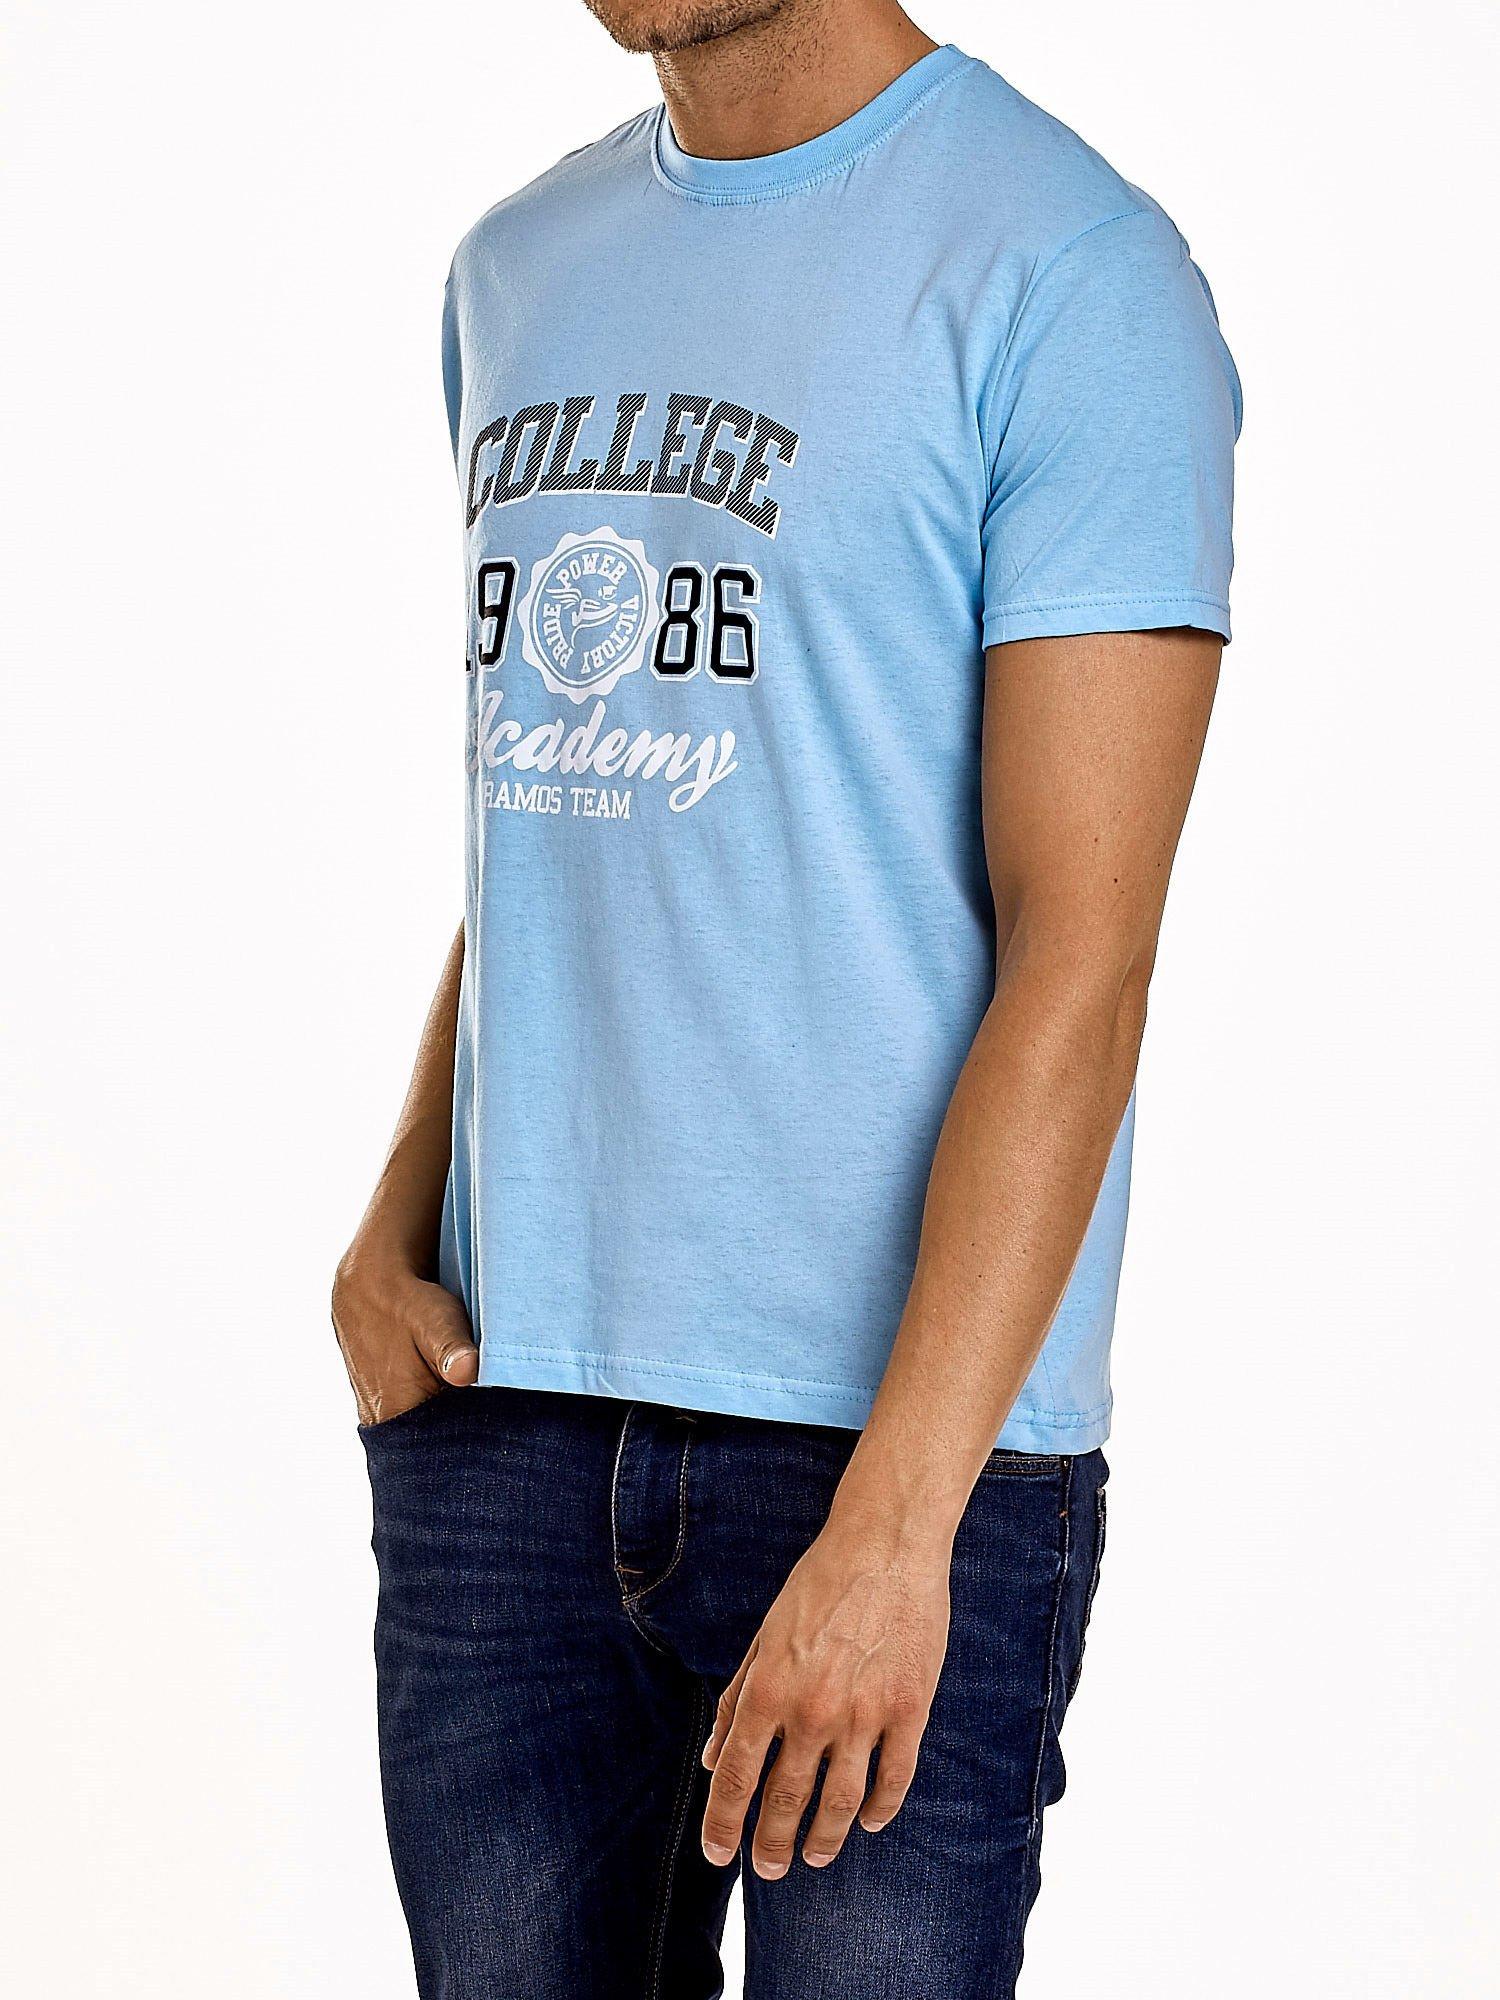 Jasnoniebieski t-shirt męski z nadrukiem i napisem COLLEGE 1986                                  zdj.                                  3